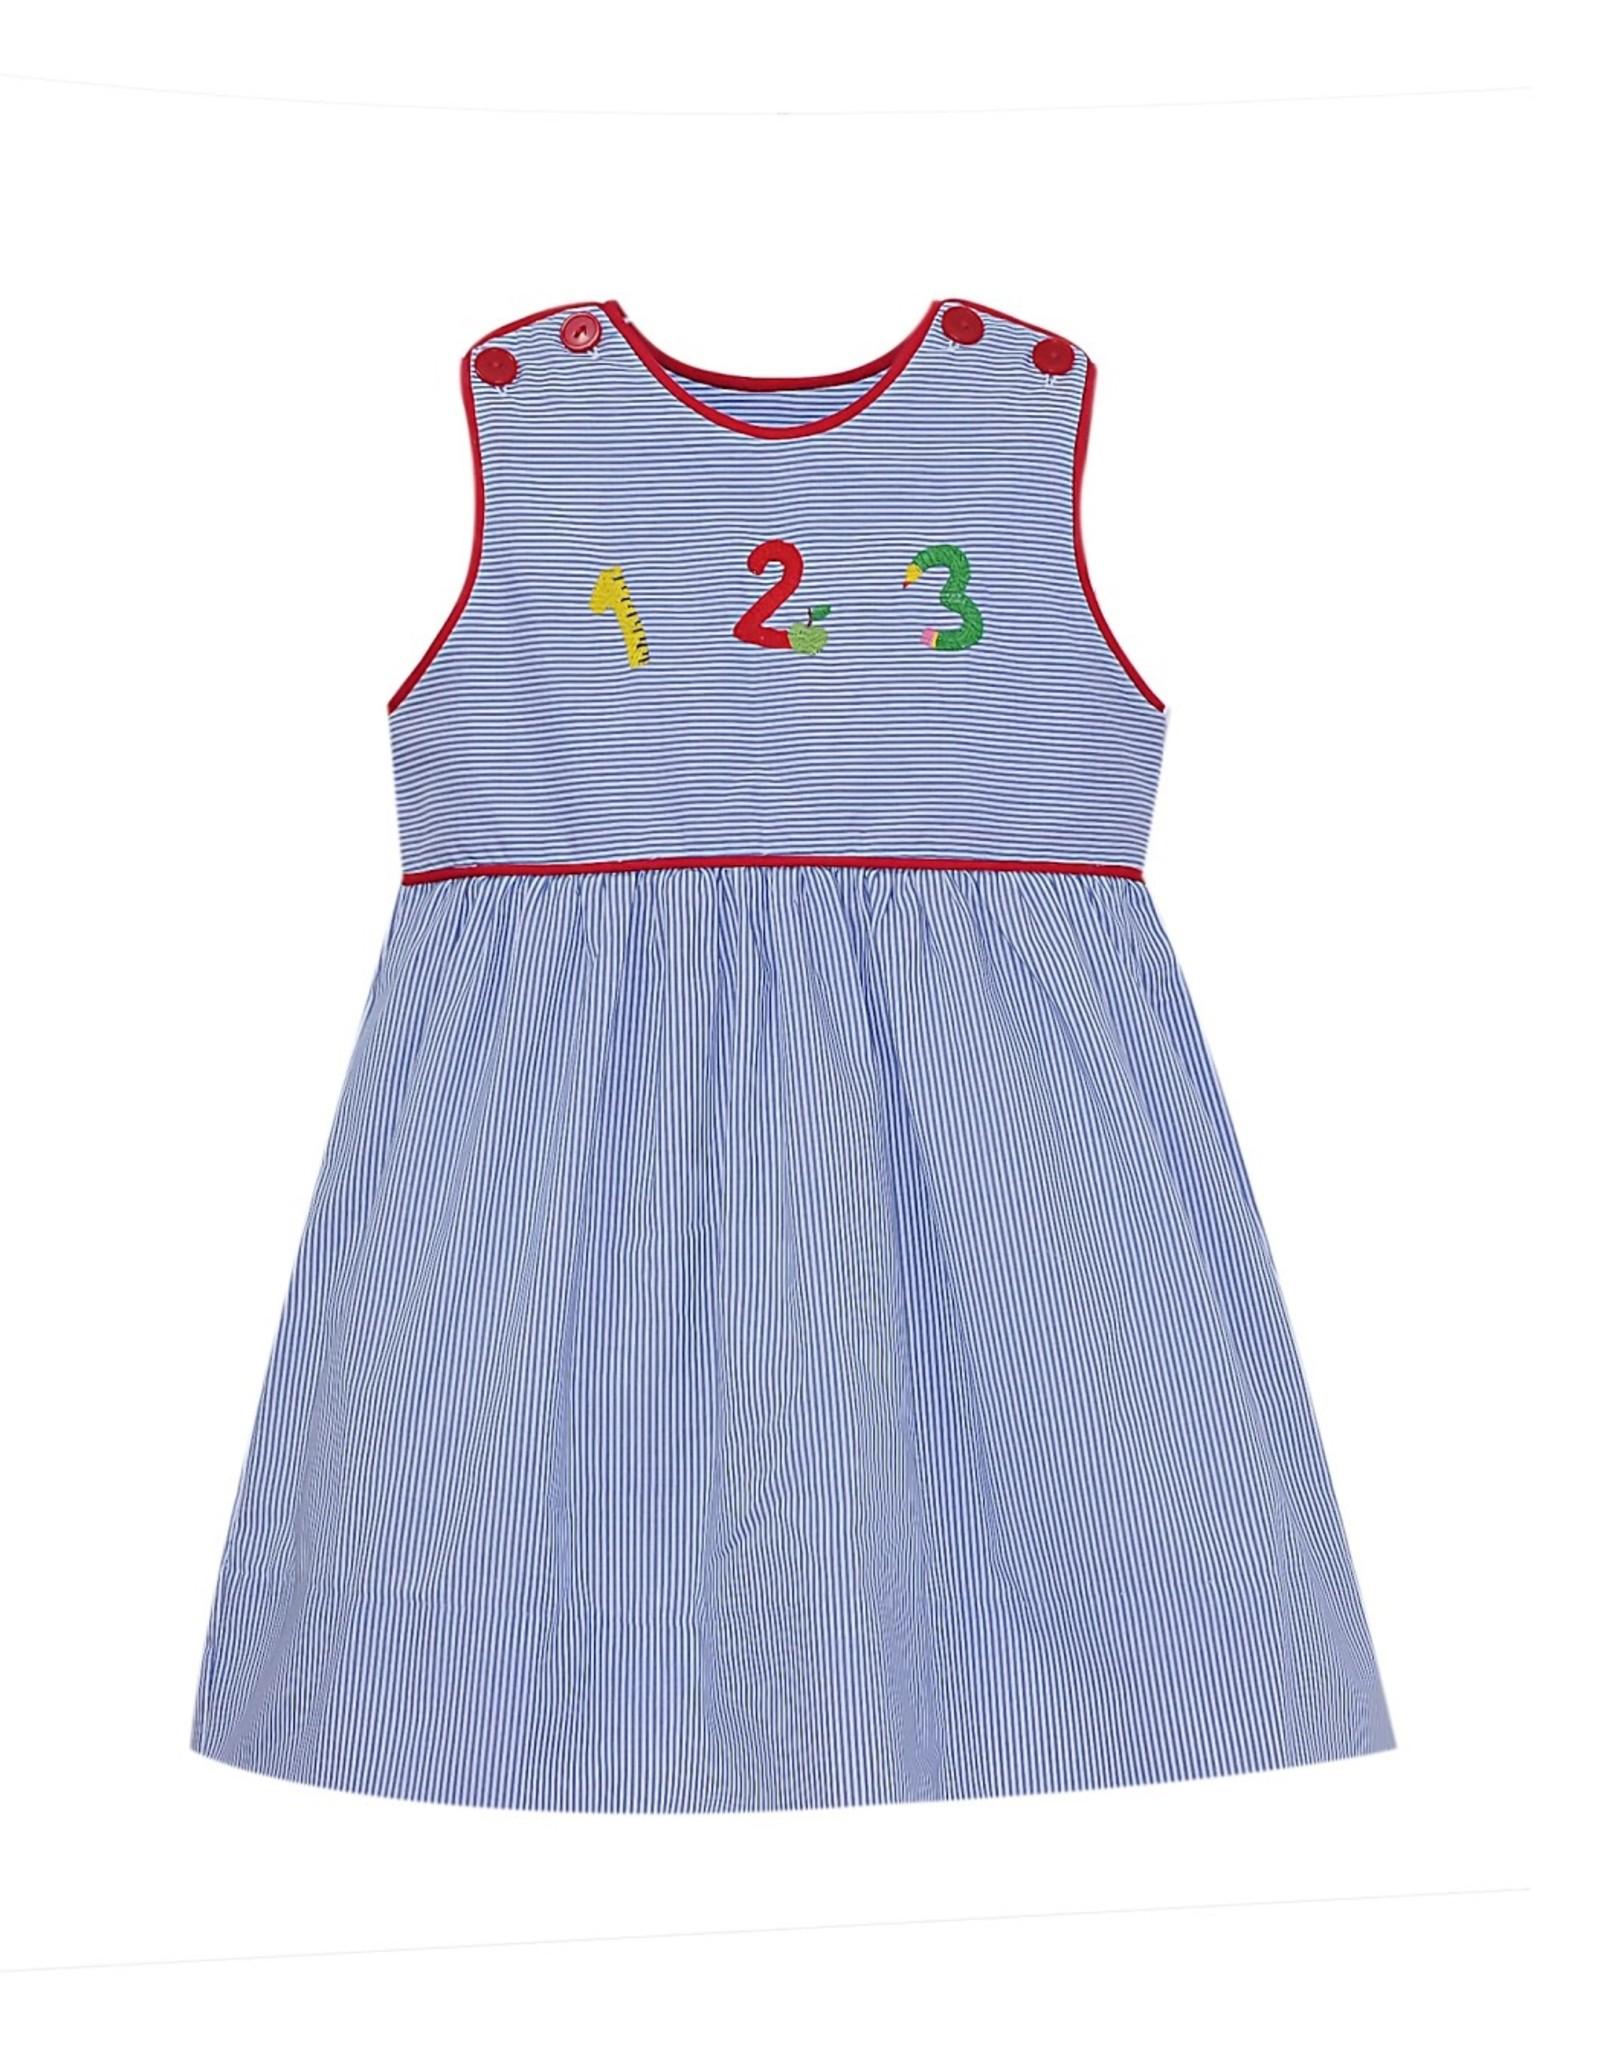 LullabySet School Days 123 Jumper